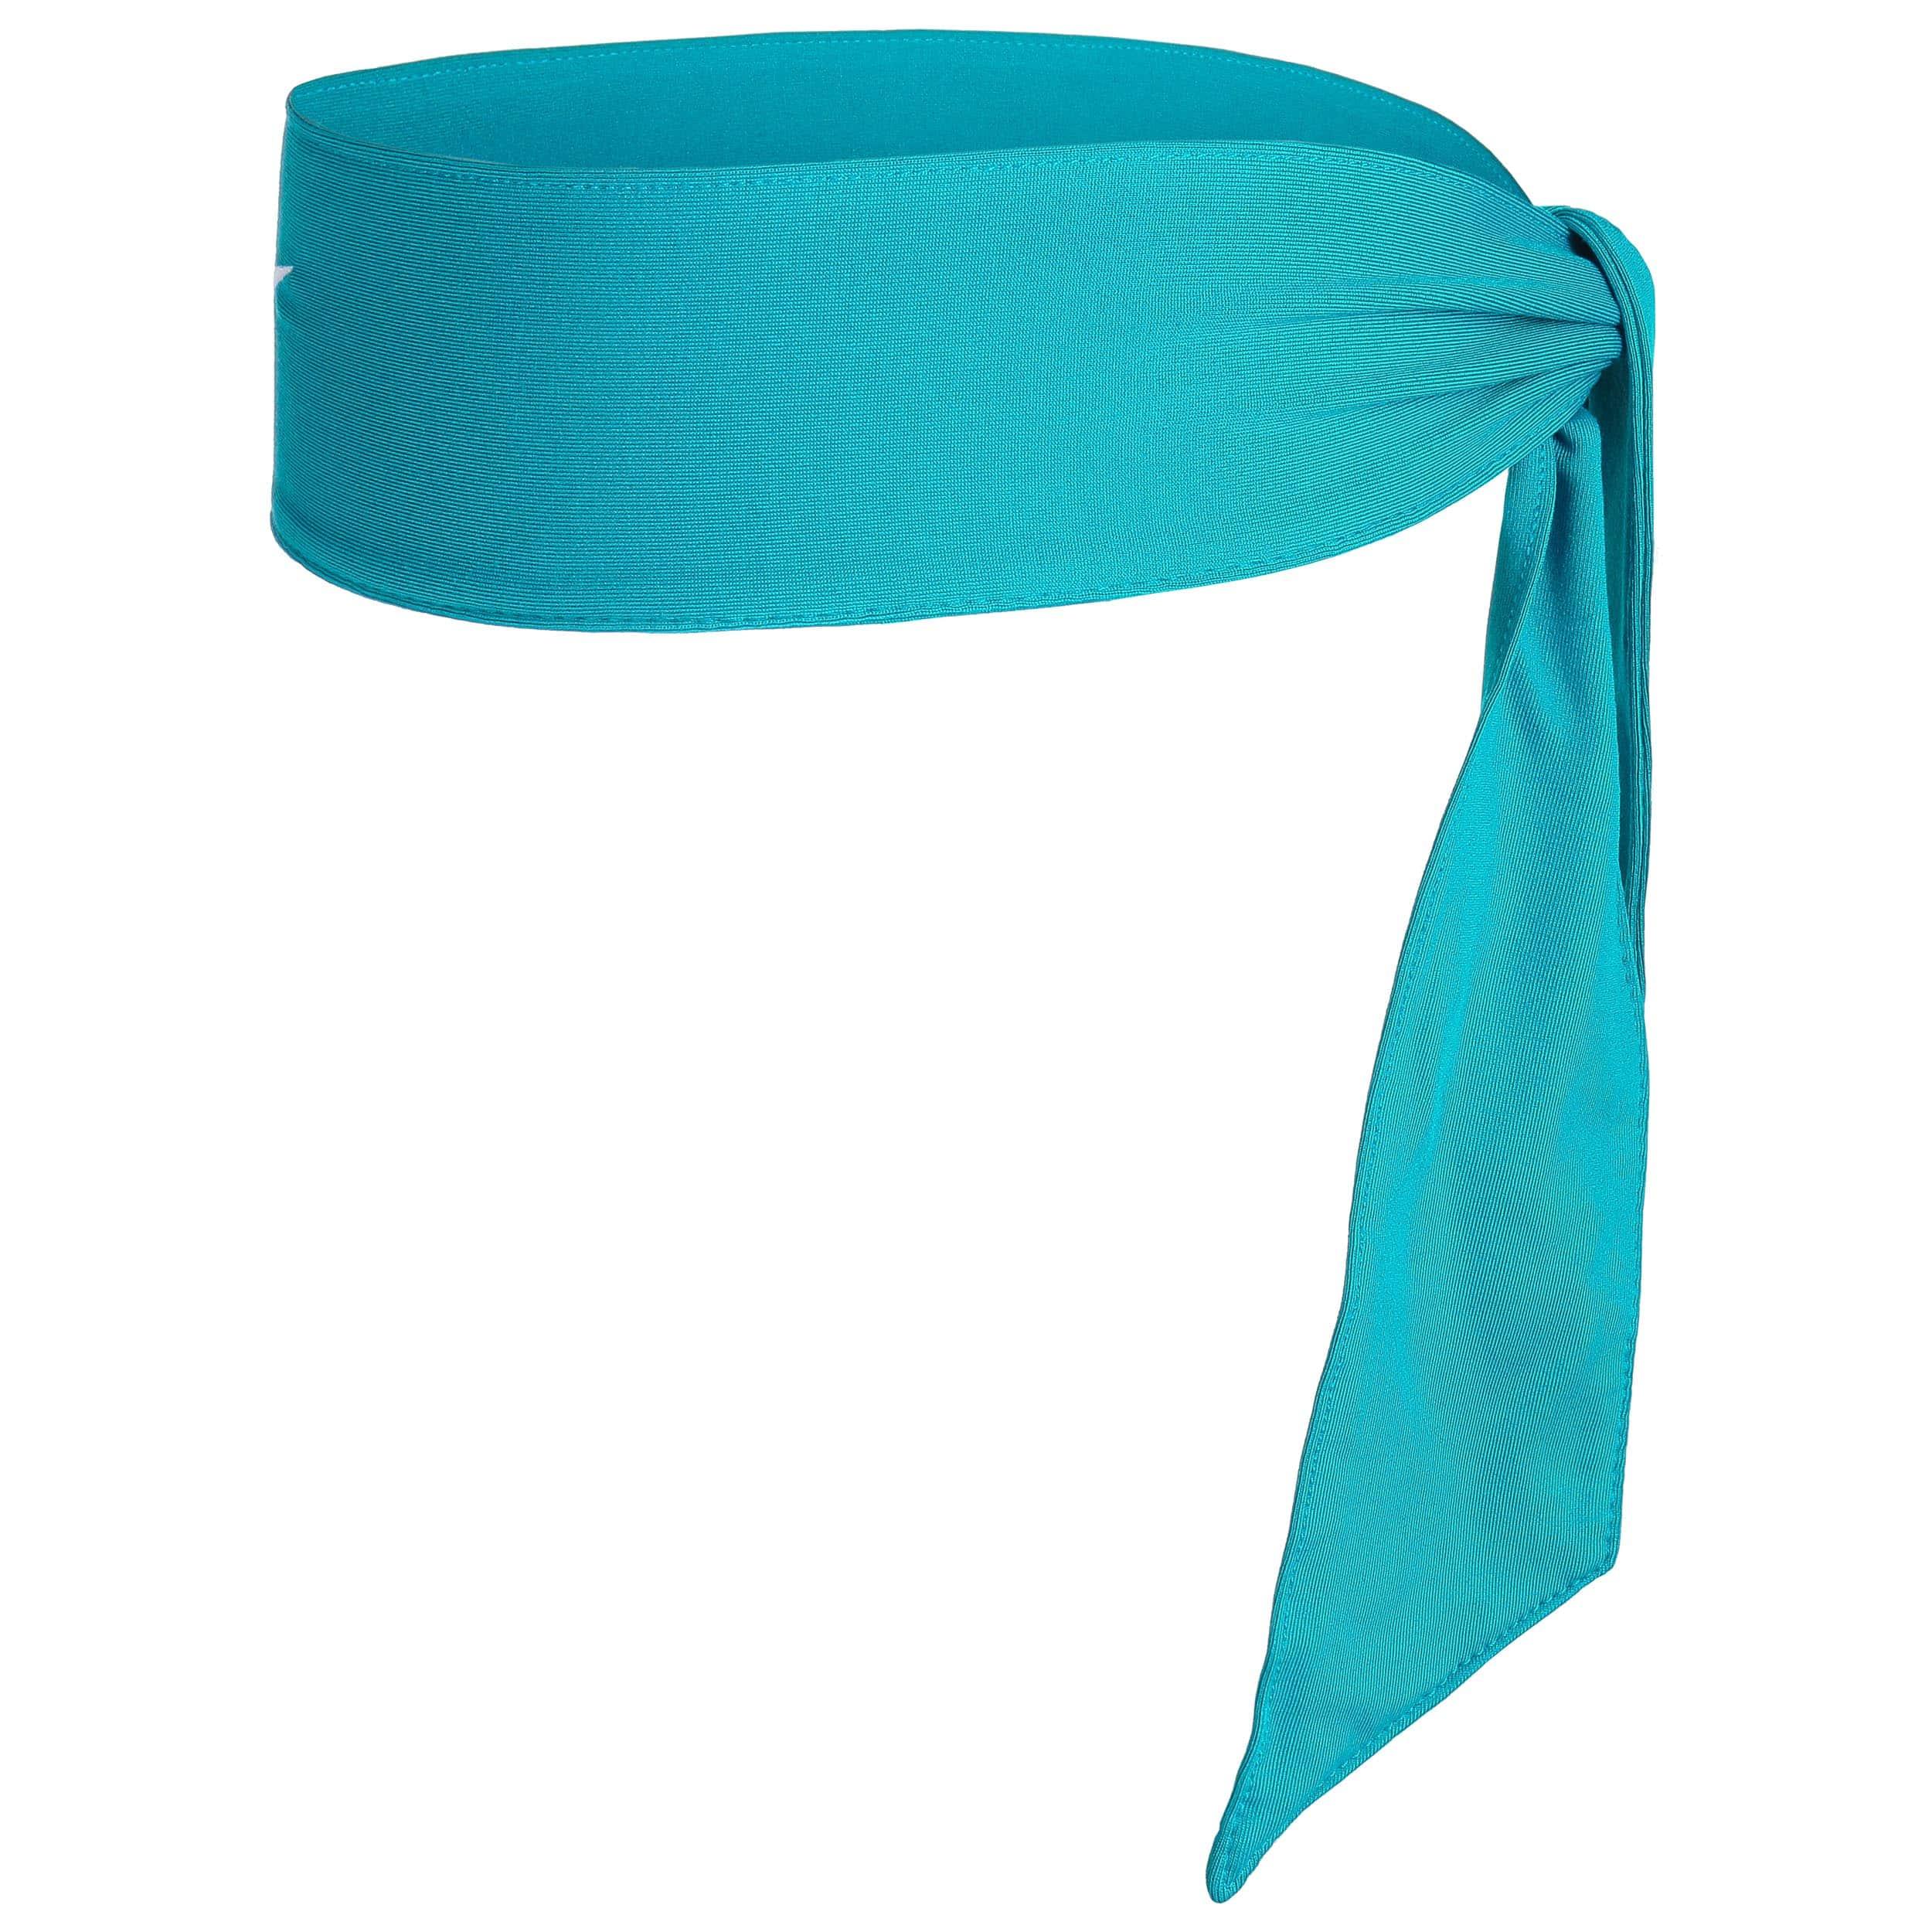 ... Fascia Nike Dri-Fit Head Tie 2.0 by Nike - turchese 3 ... 4ebf14ed7bc9